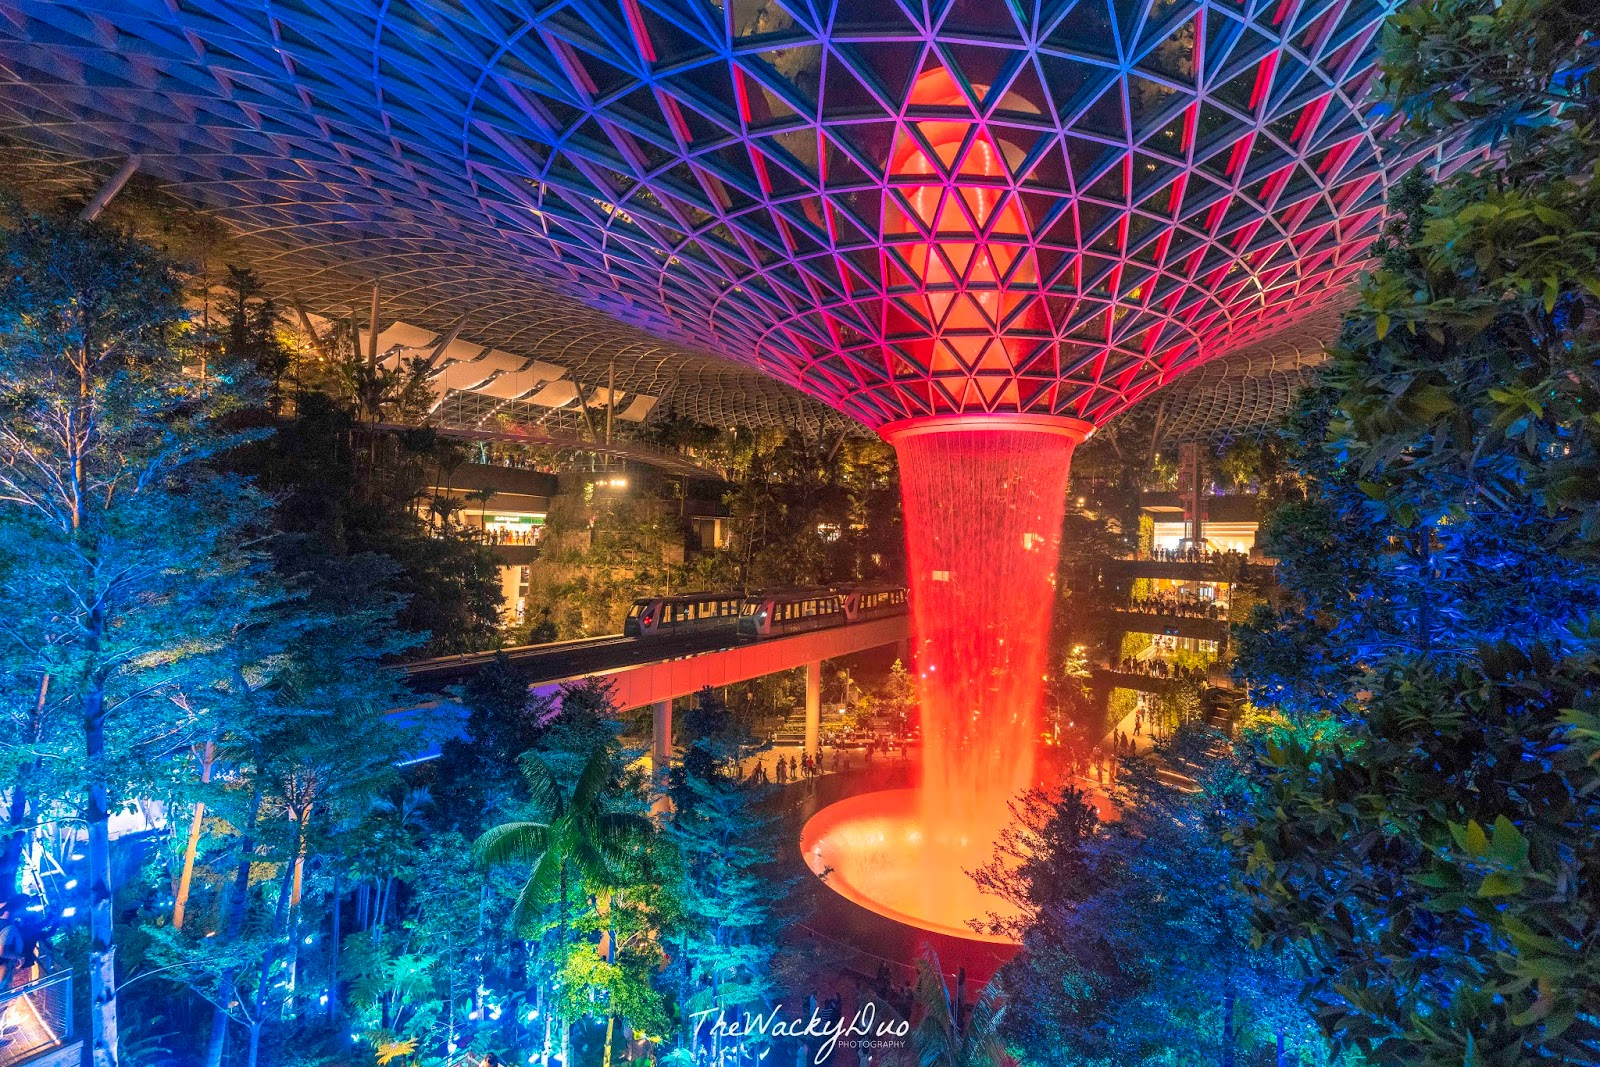 Rain Vortex Light Show Jewel Changi Airport 5 Important